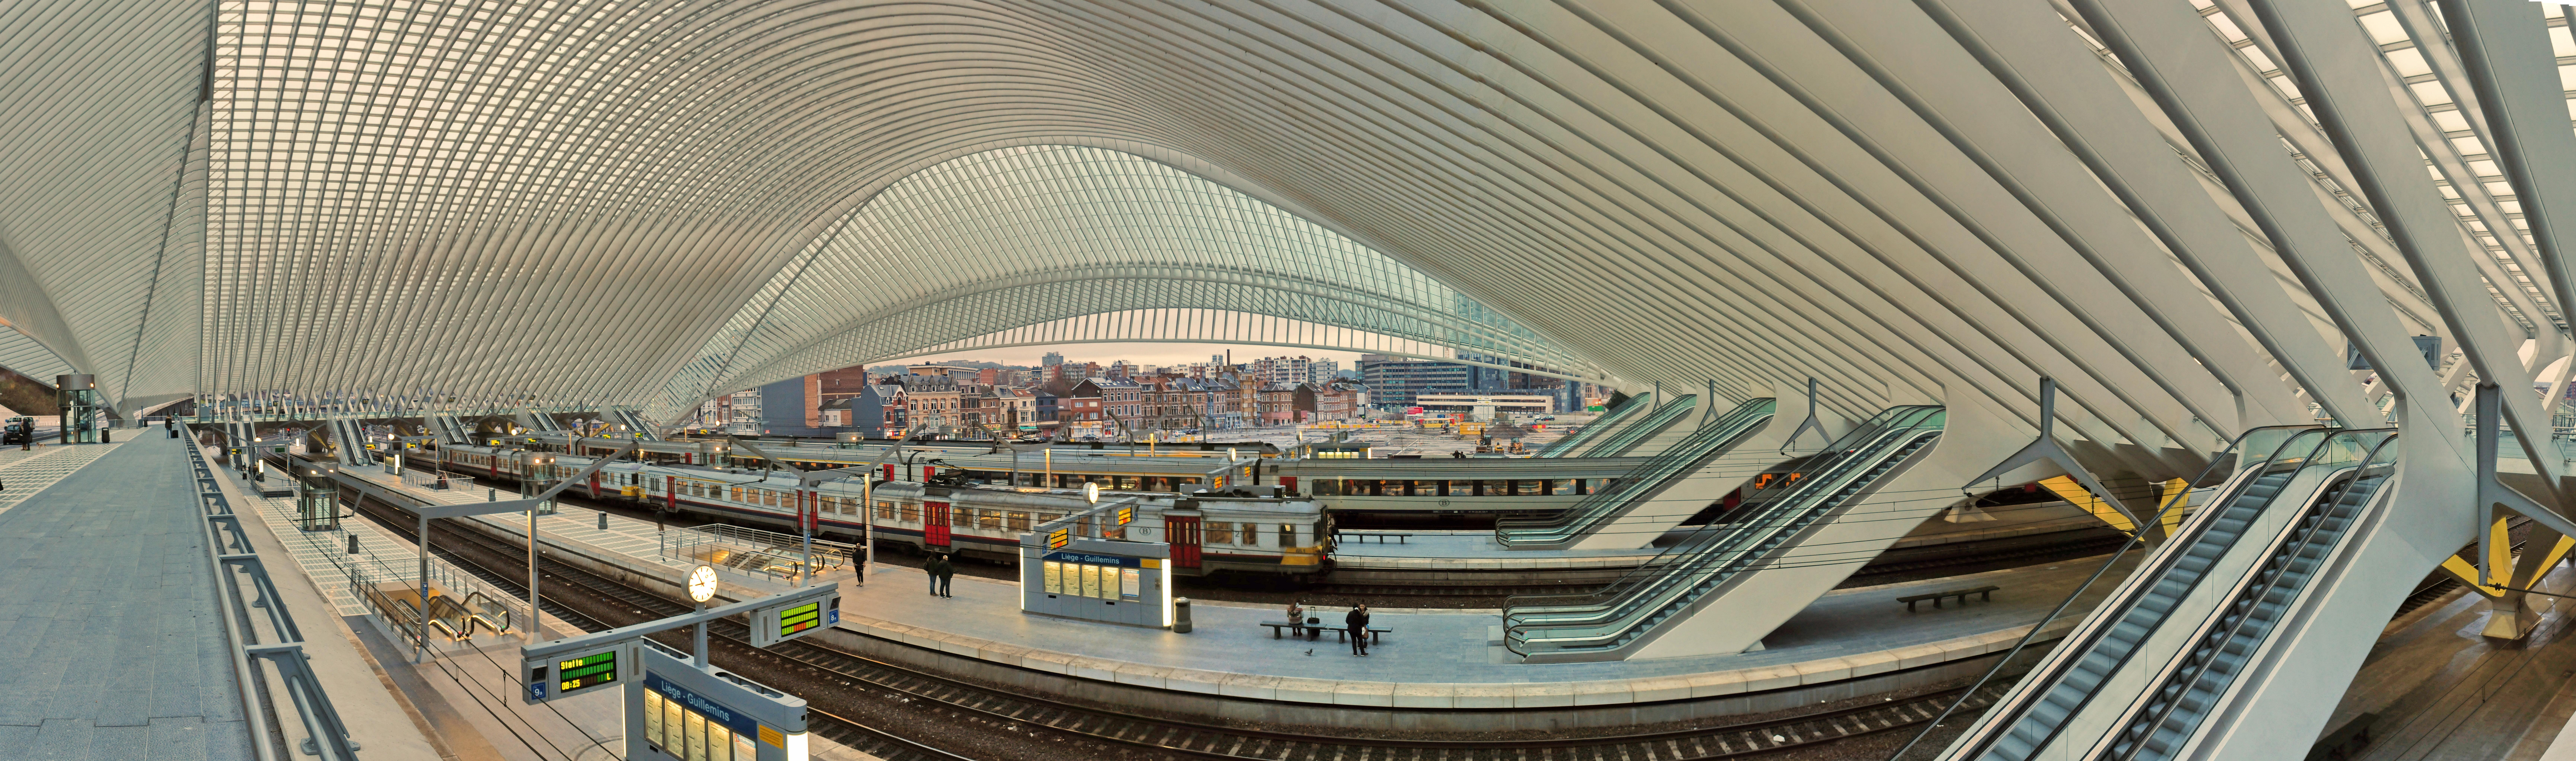 Station Guillemins, toch nog iets moois in Luik (Foto: WikiCommons)